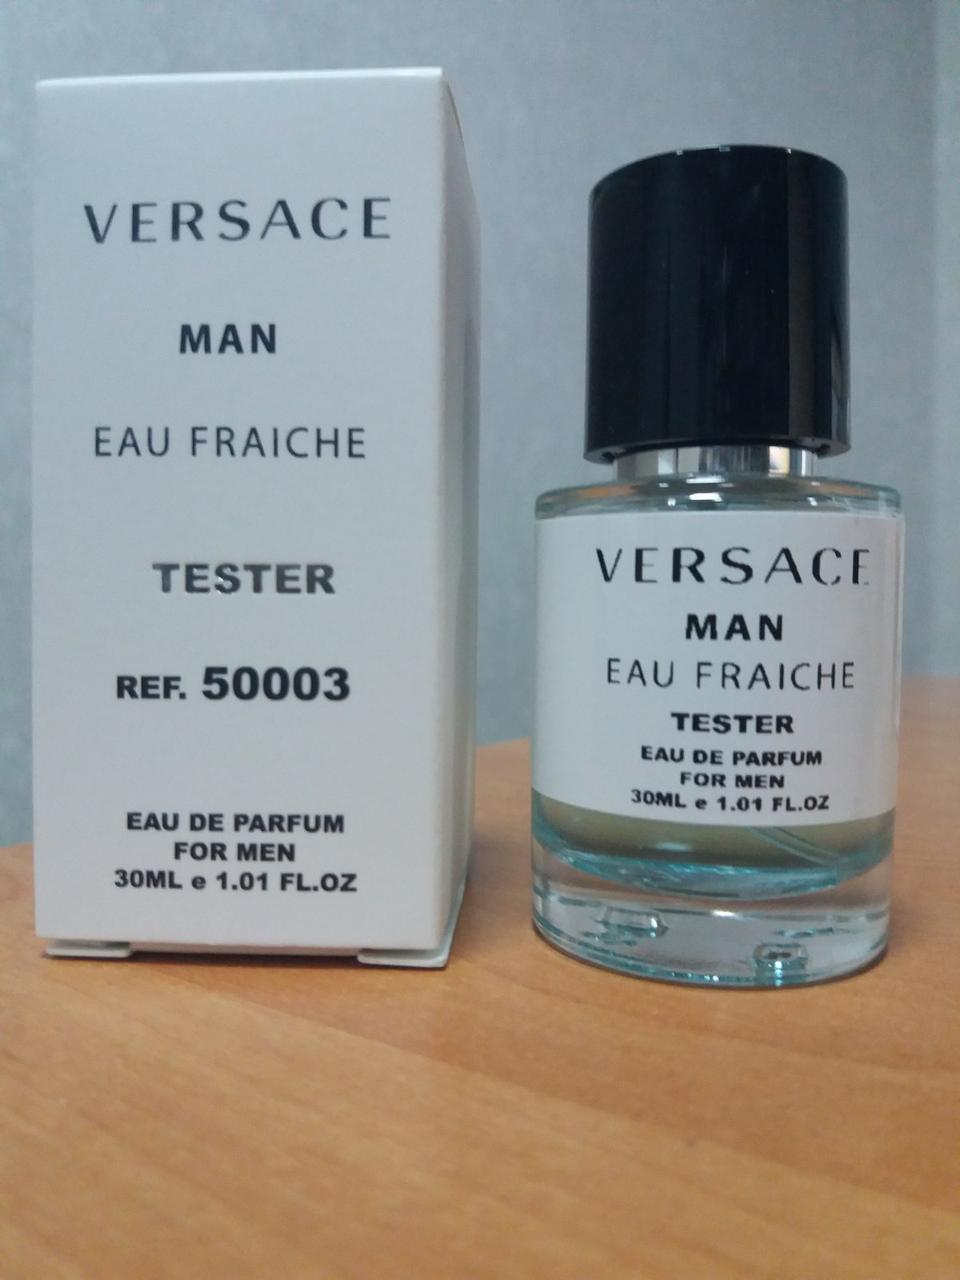 Мужская парфюмерия Versace Man Eau Fraiche (версаче фрэш мэн) тестер 30 ml ОАЭ (реплика)